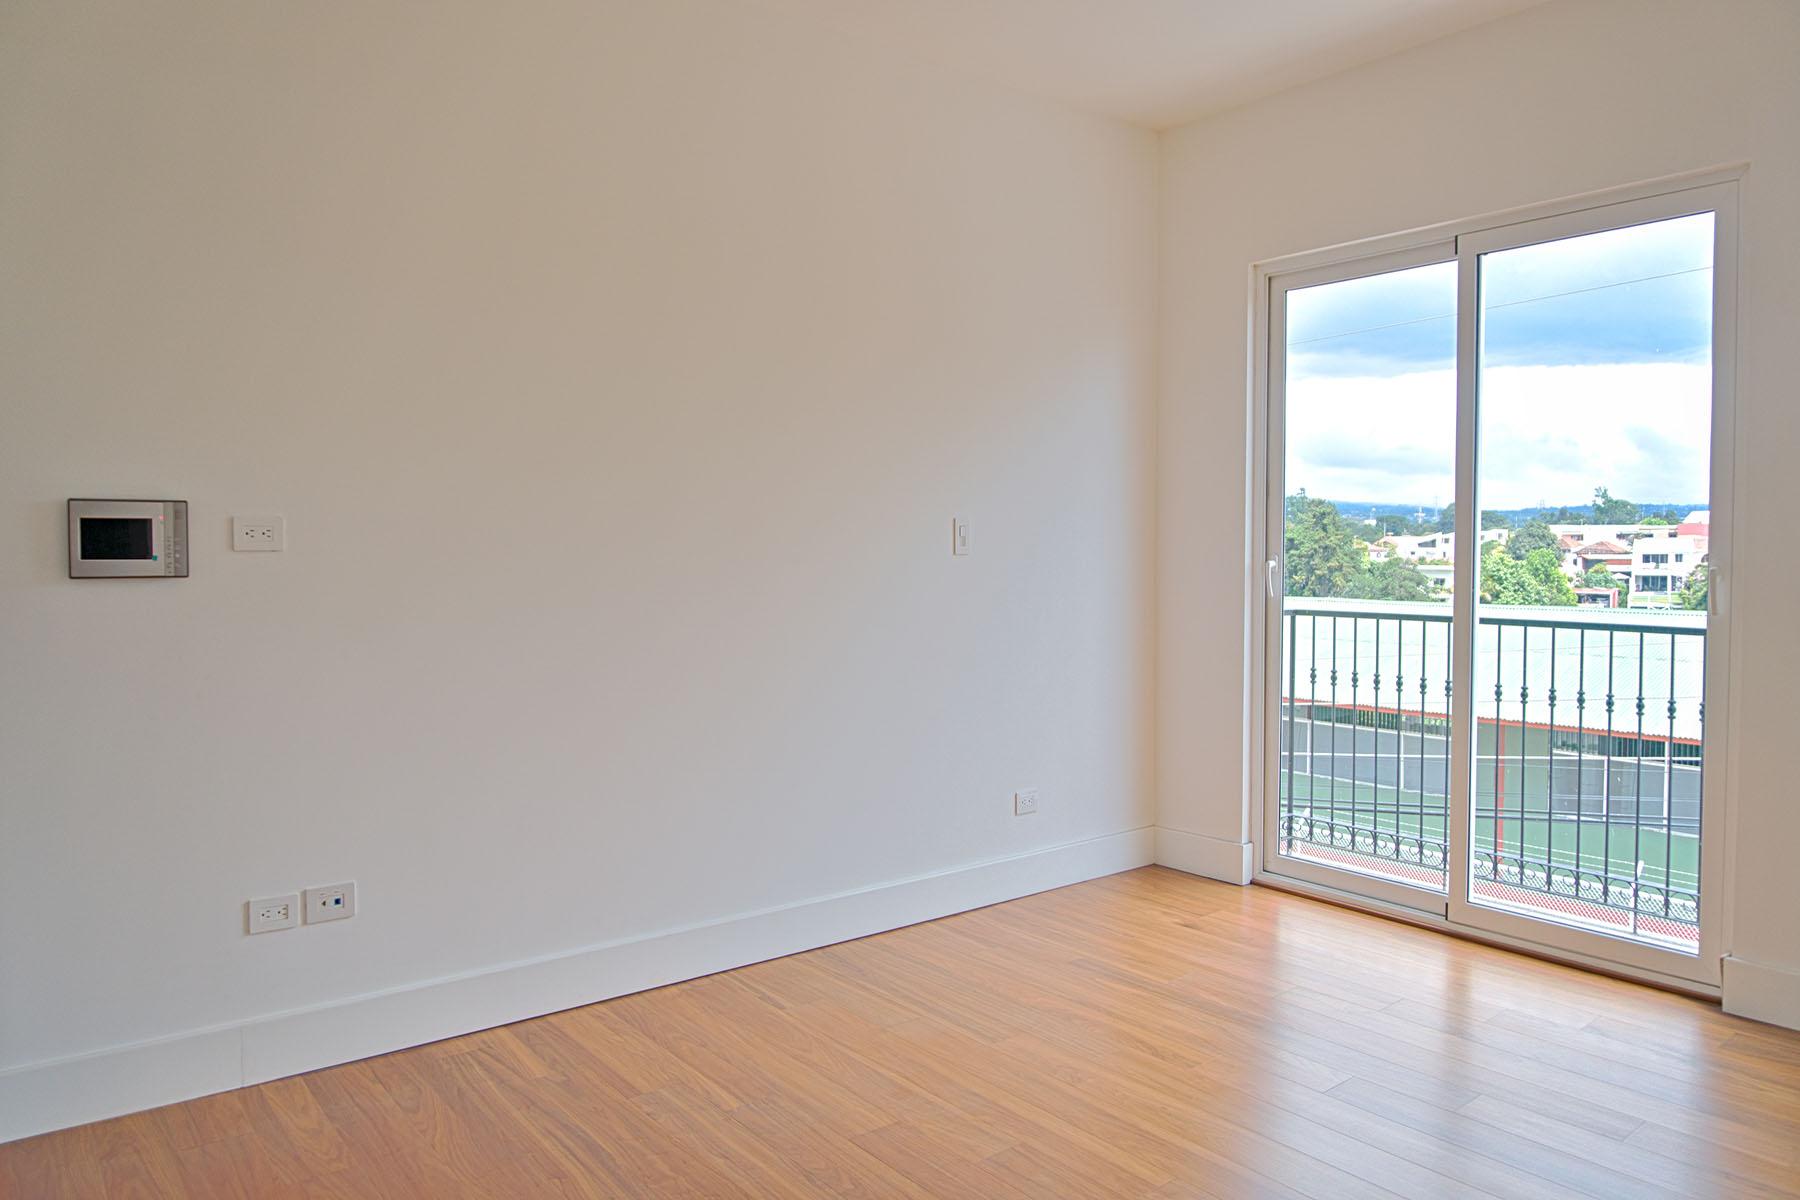 Additional photo for property listing at Rohrmoser 88 Rohrmoser, San Jose Costa Rica